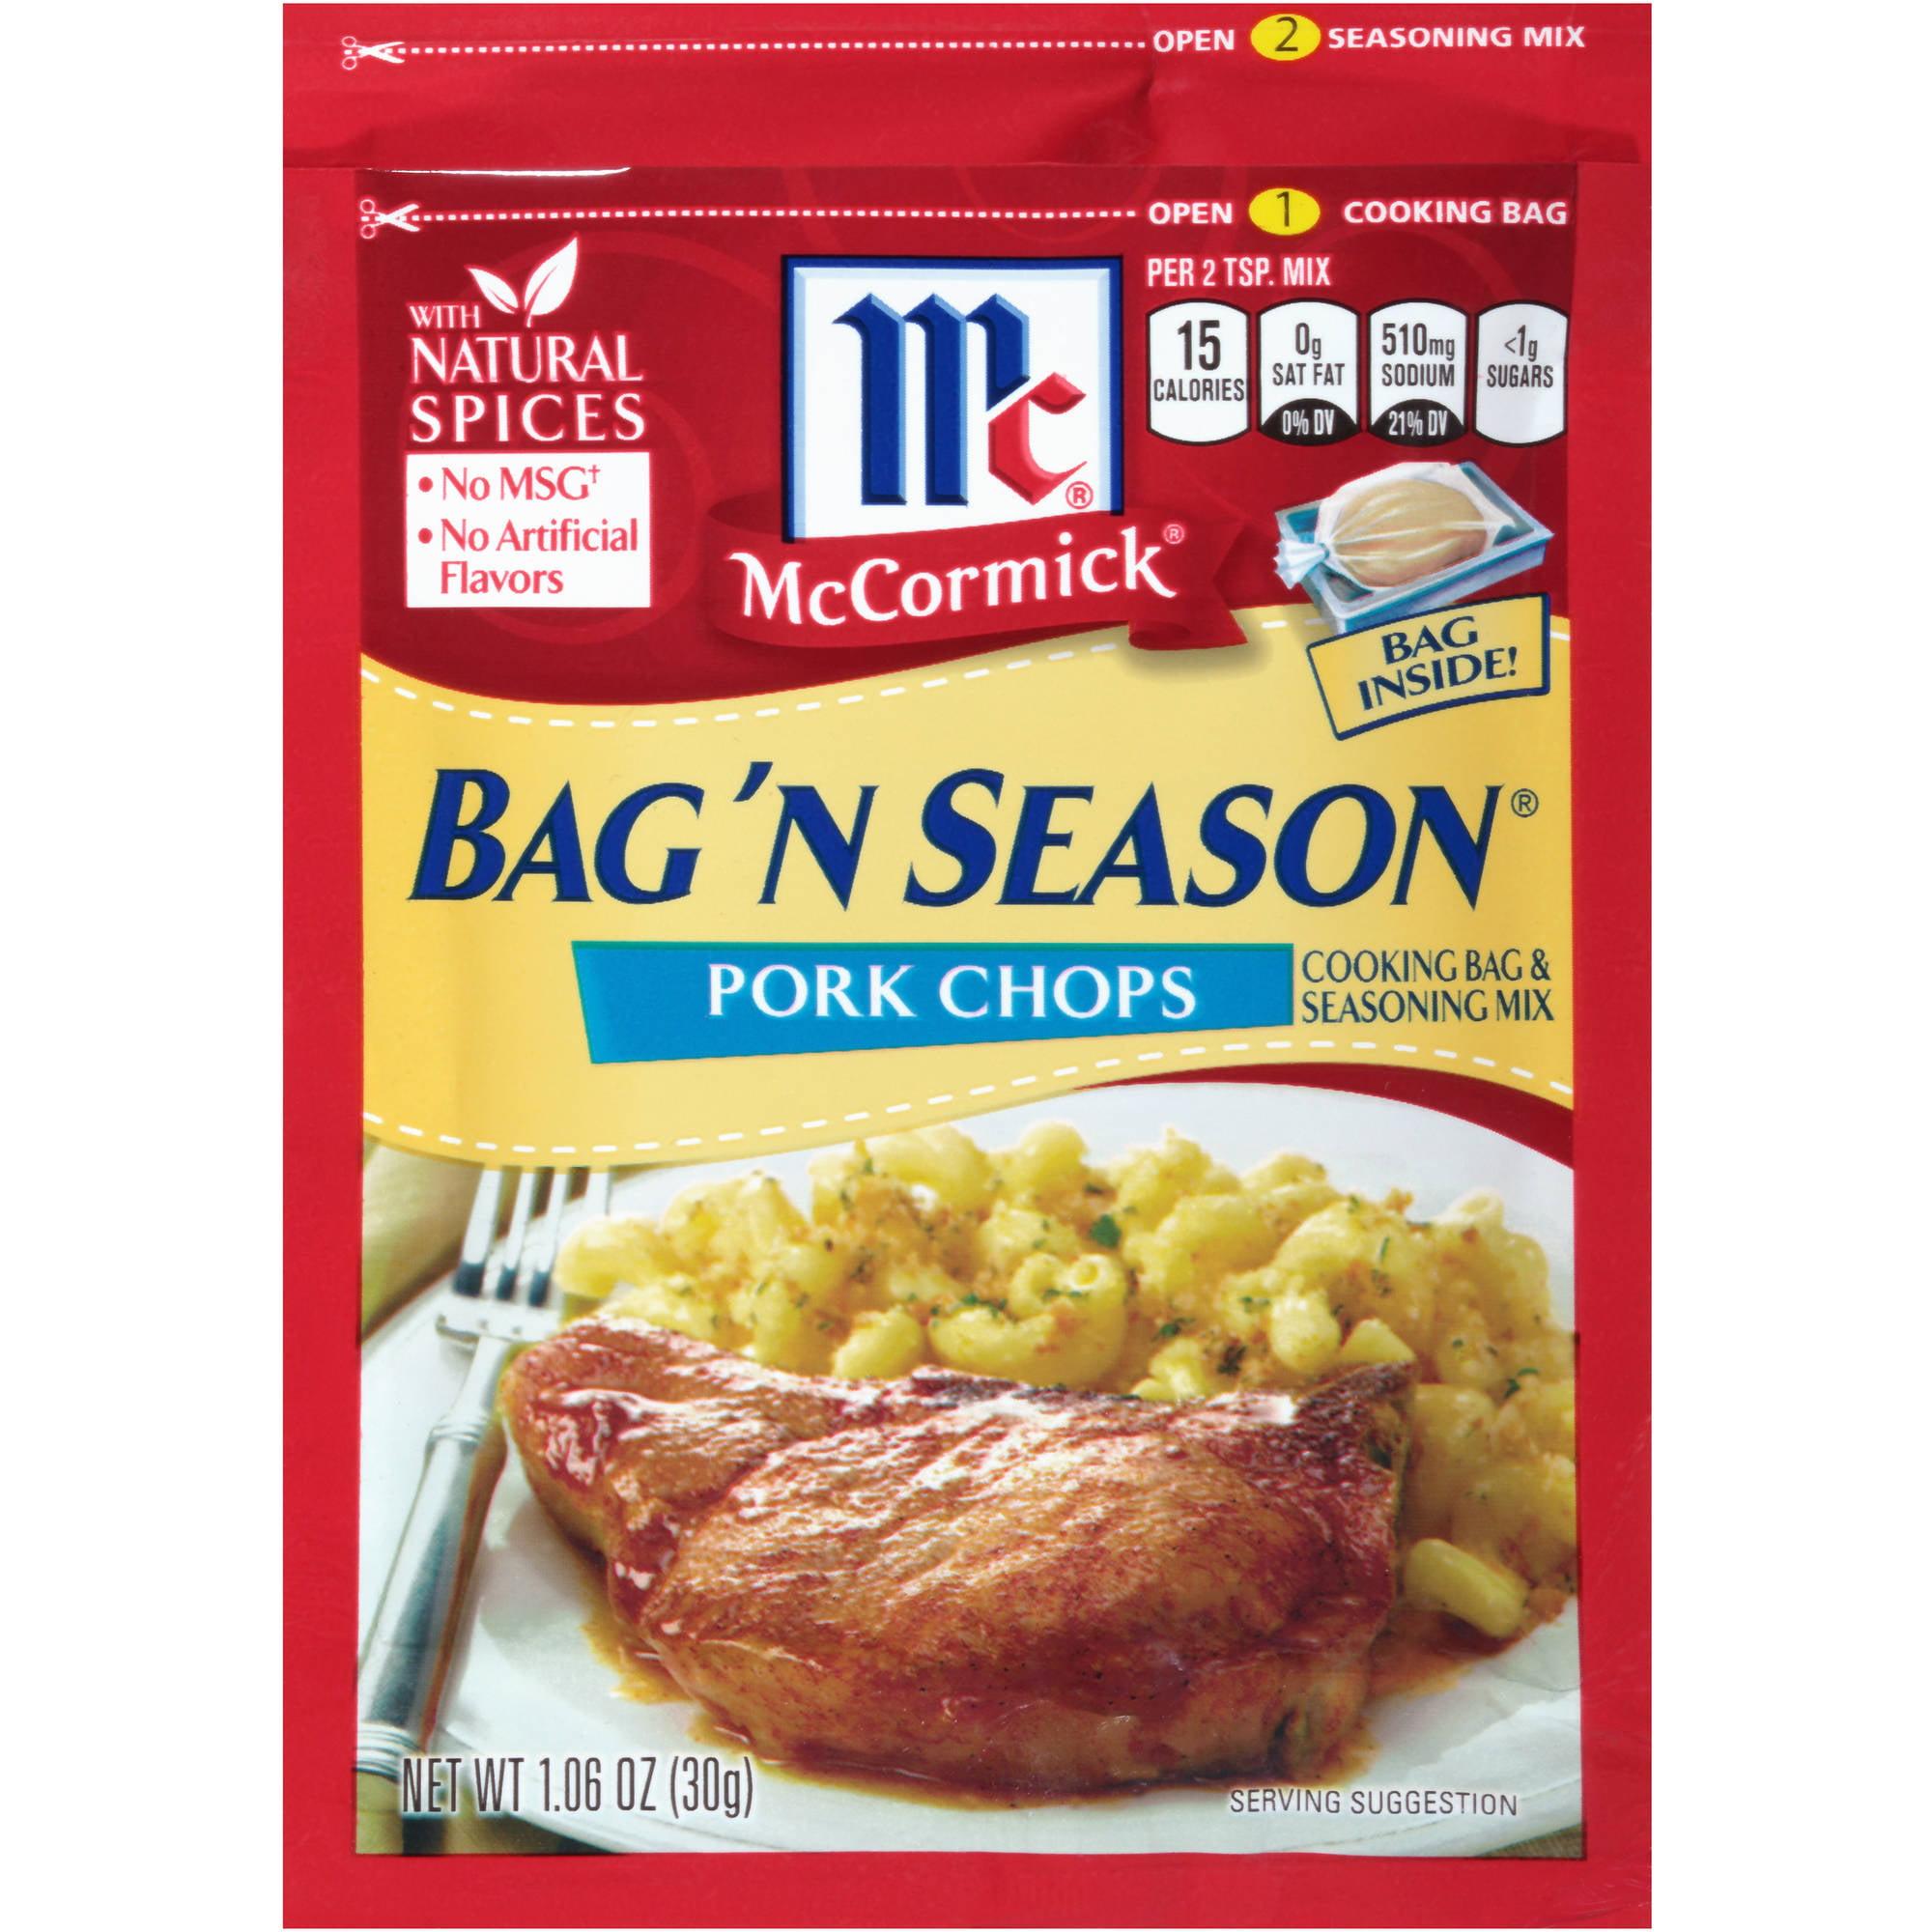 Cooking bag pork chop recipes